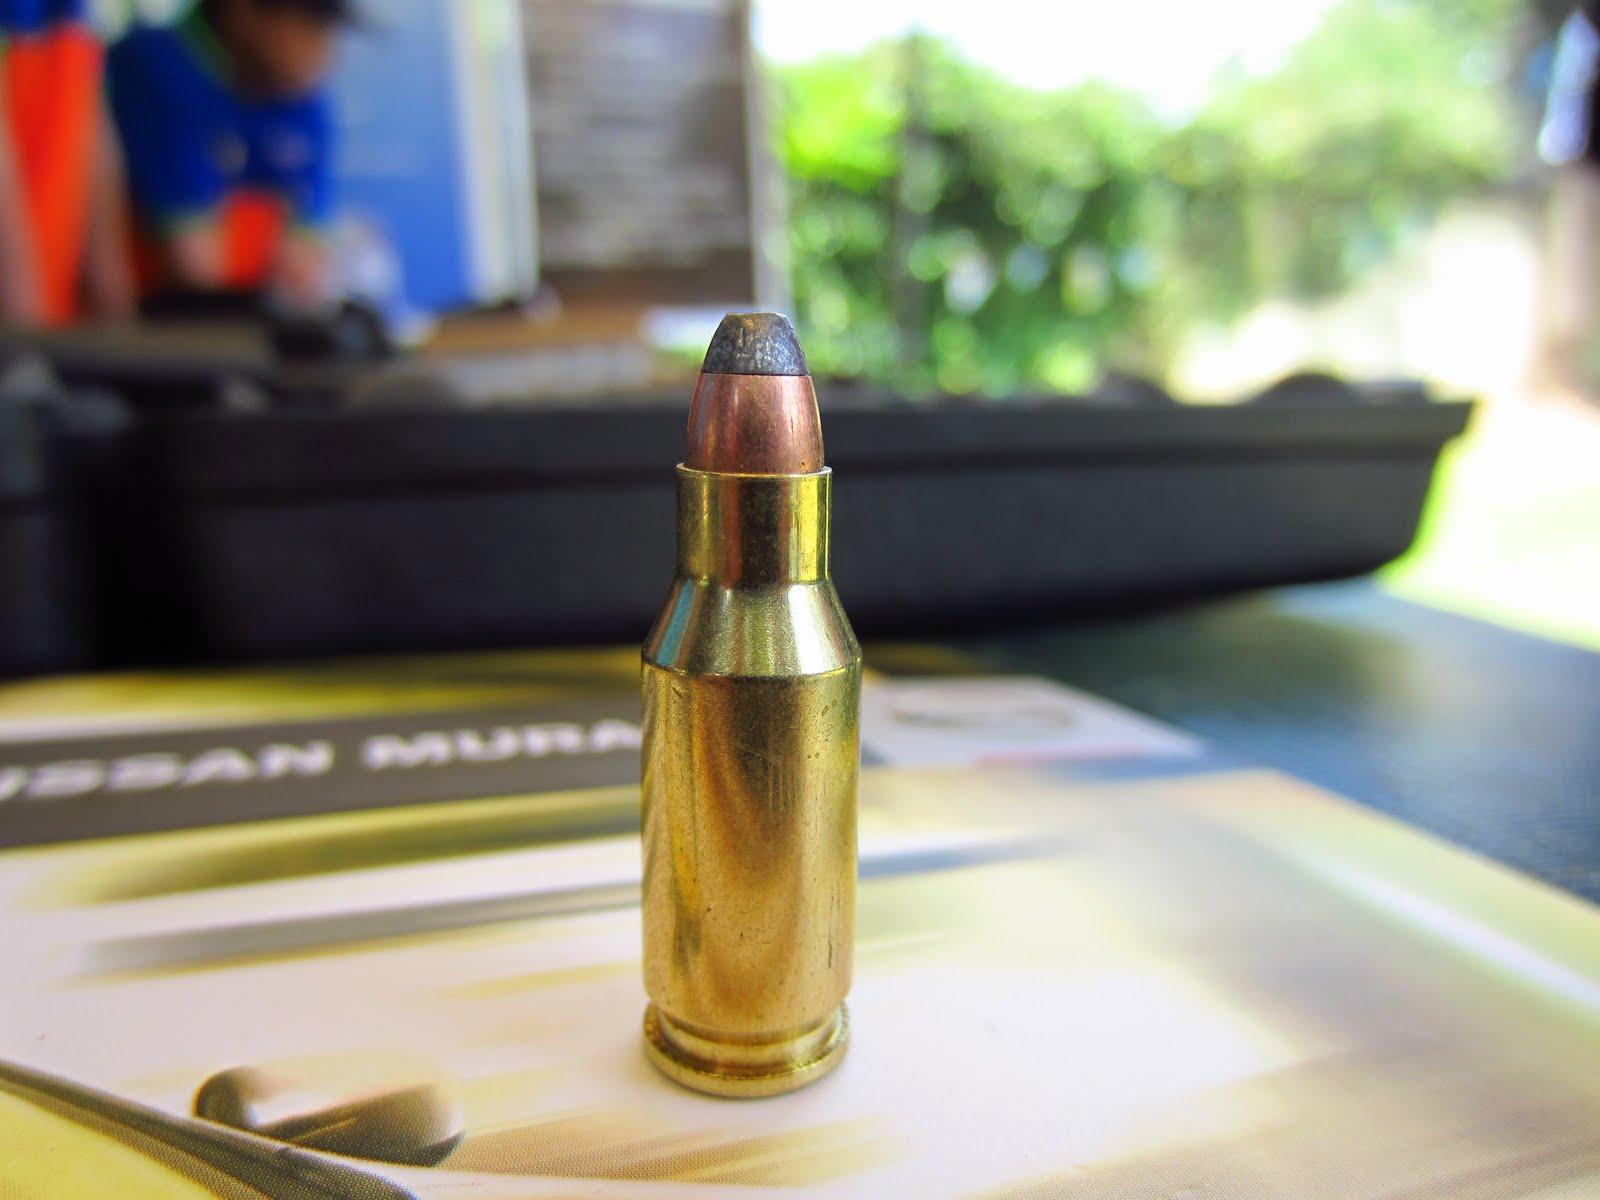 22 TCM Micromag, PK224S, 22 Reed Express, 9mm BOZ - General